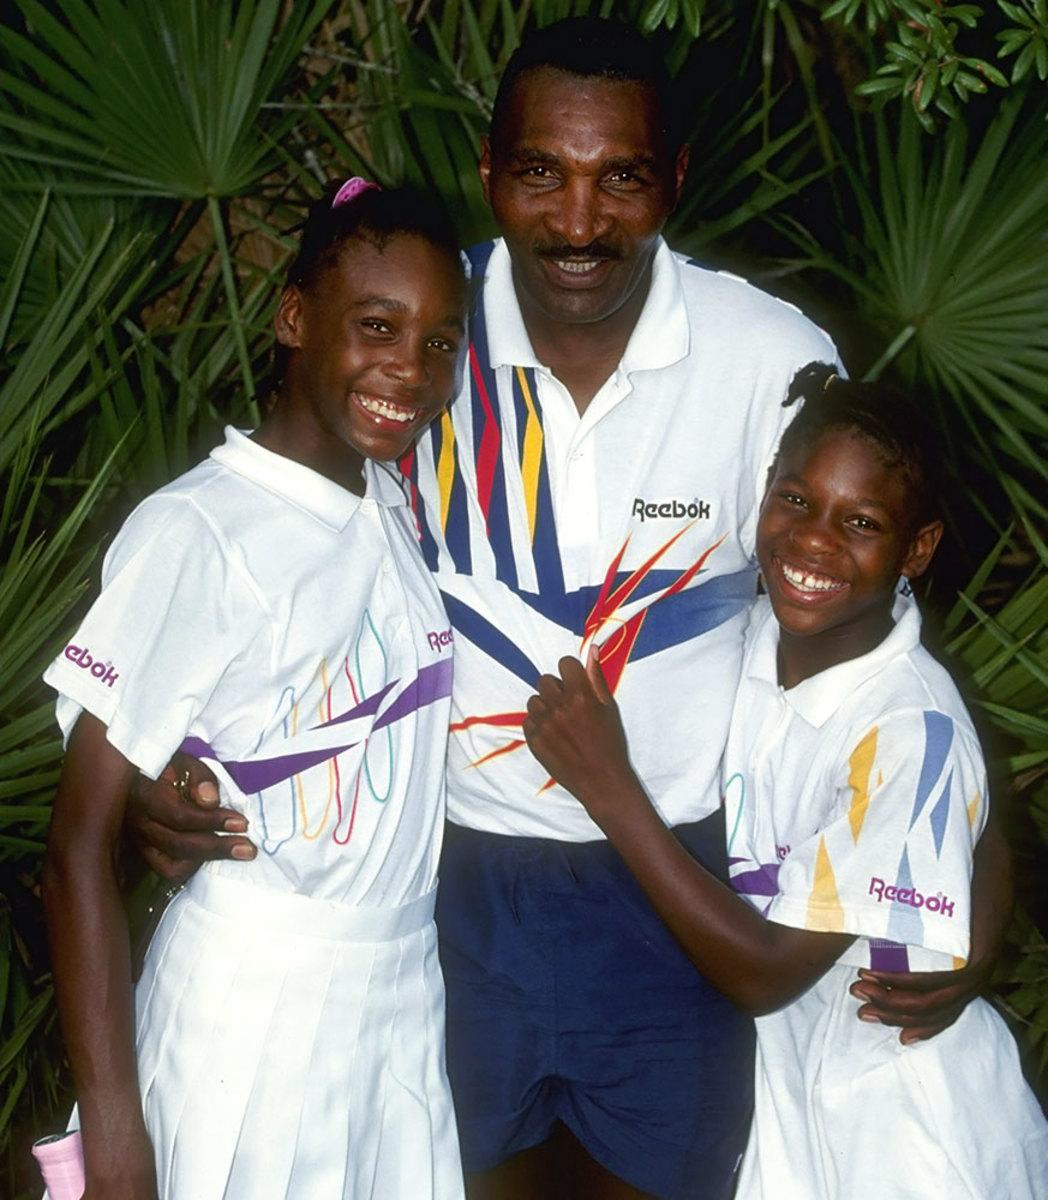 1992-Venus-Serena-Williams-father-Richard.jpg